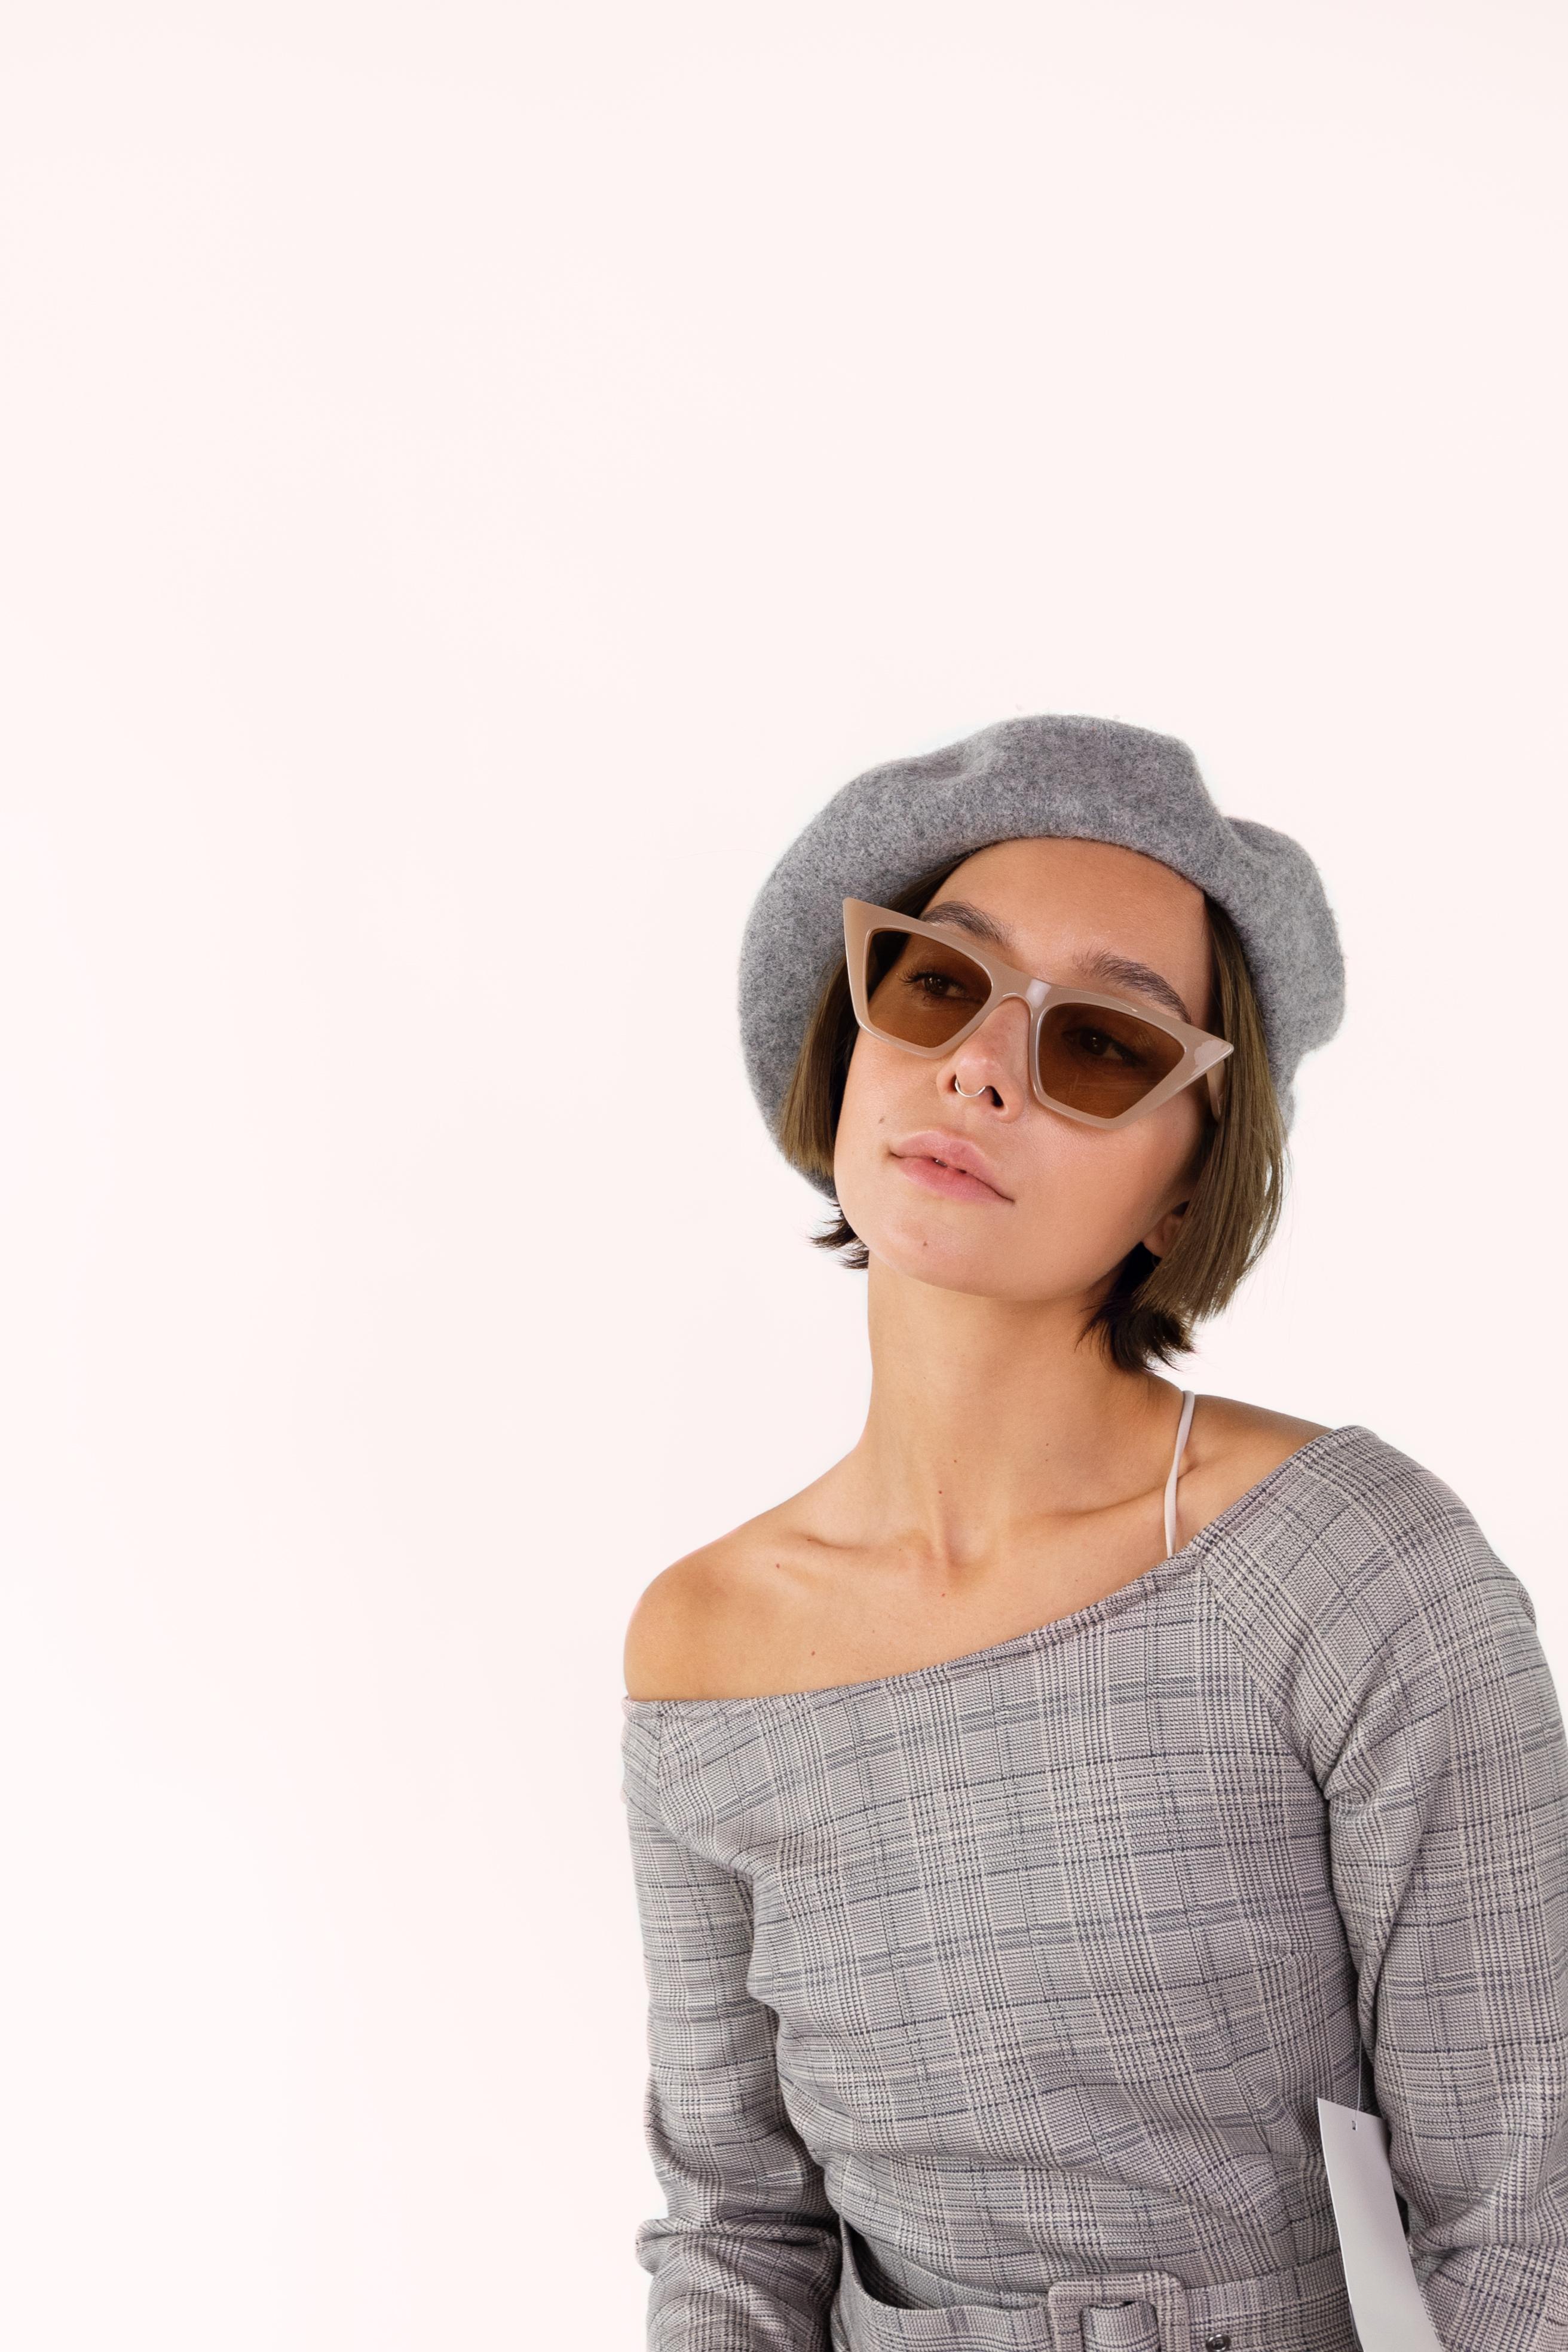 http://www.shopmiim.com/products/joanne